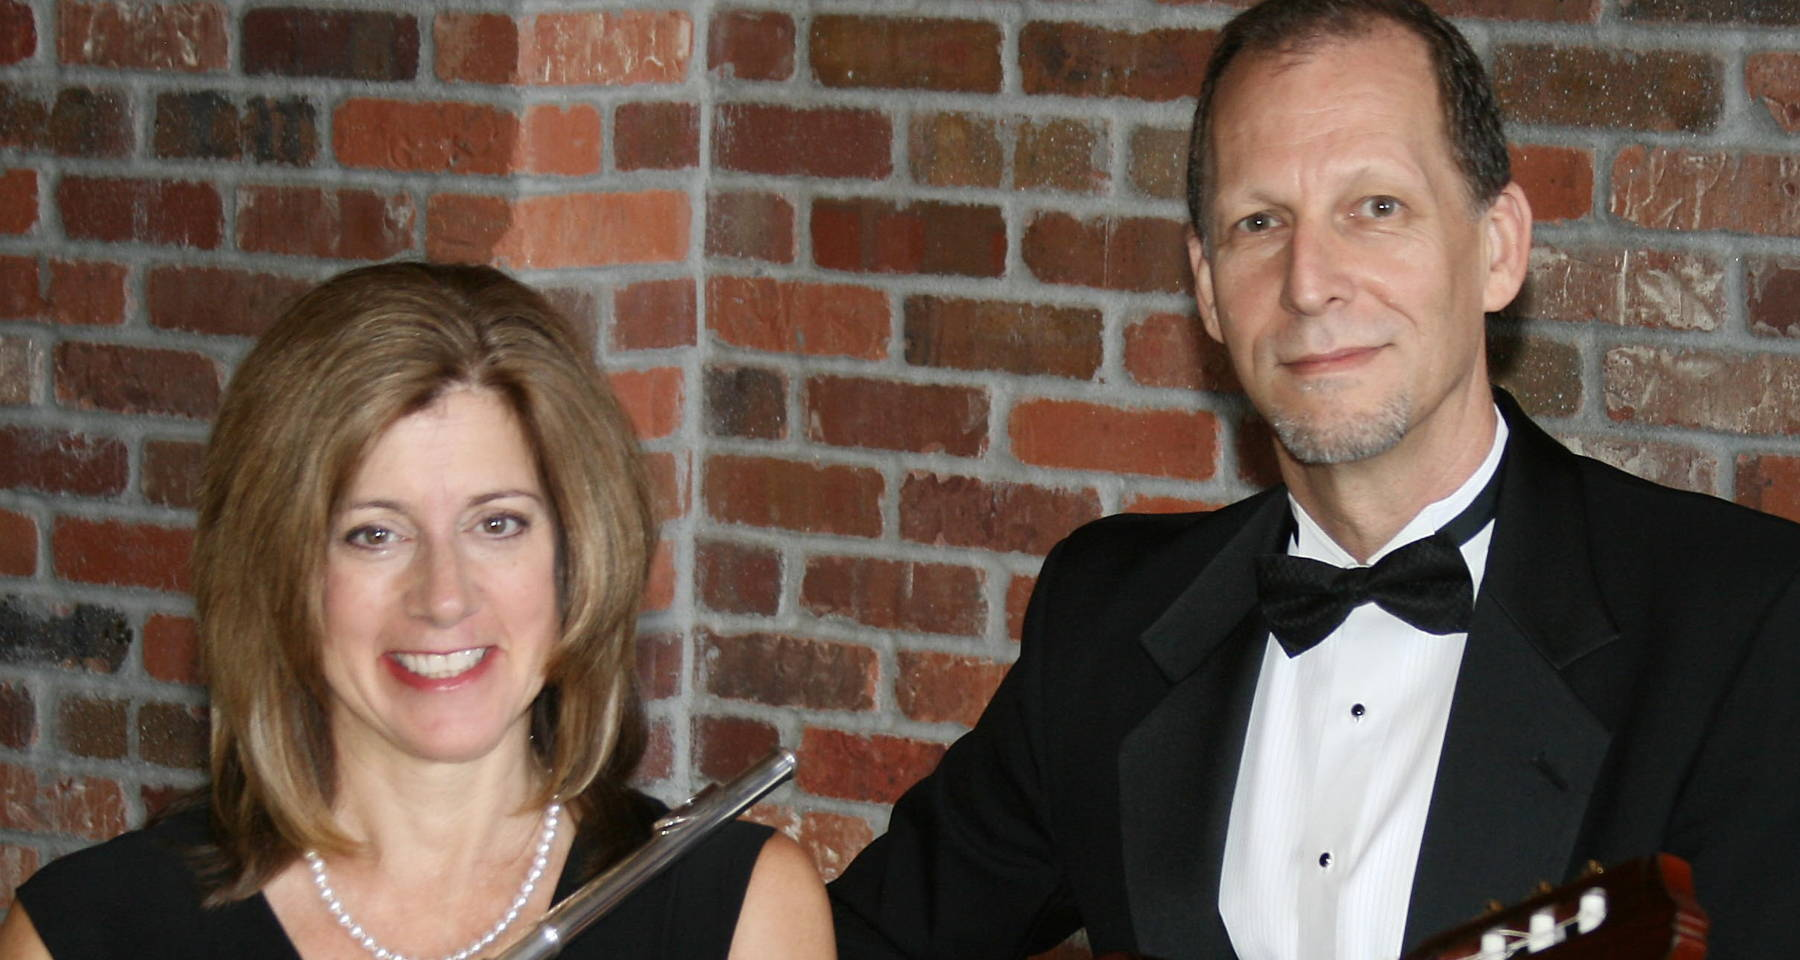 Daniel & Francesca, guitar and flute, in concert June 20!